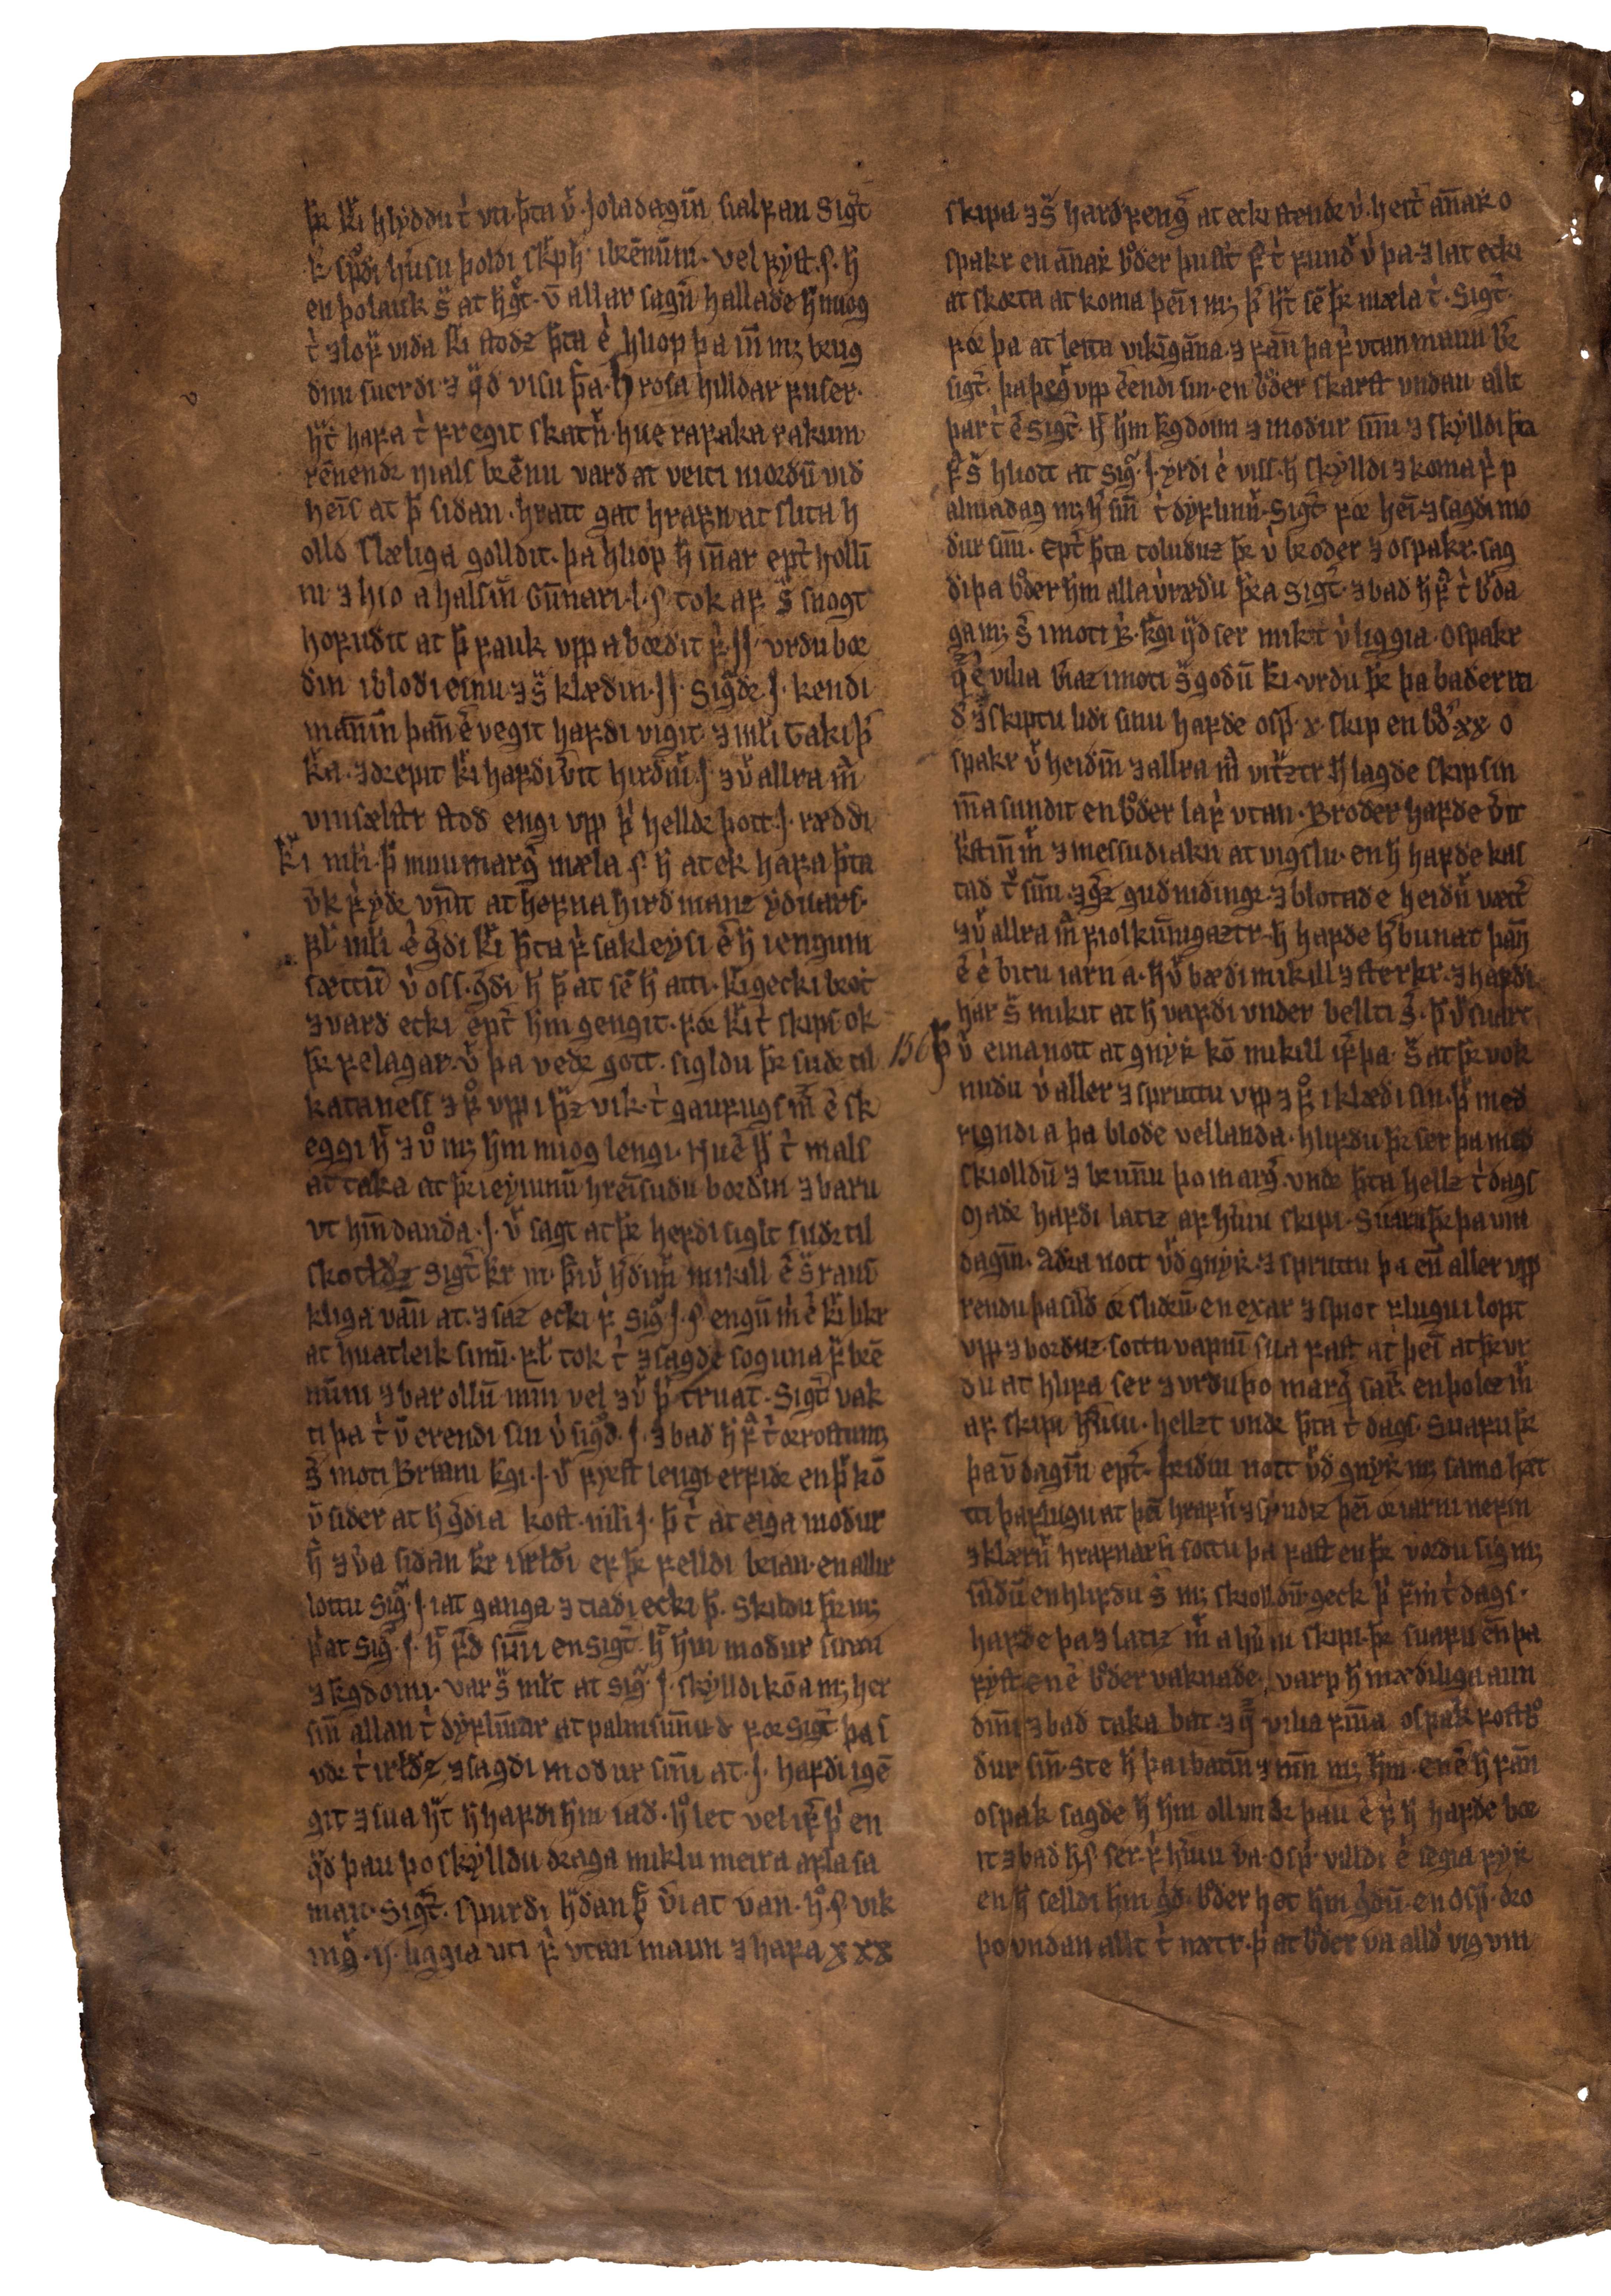 AM 132 fol - 59v